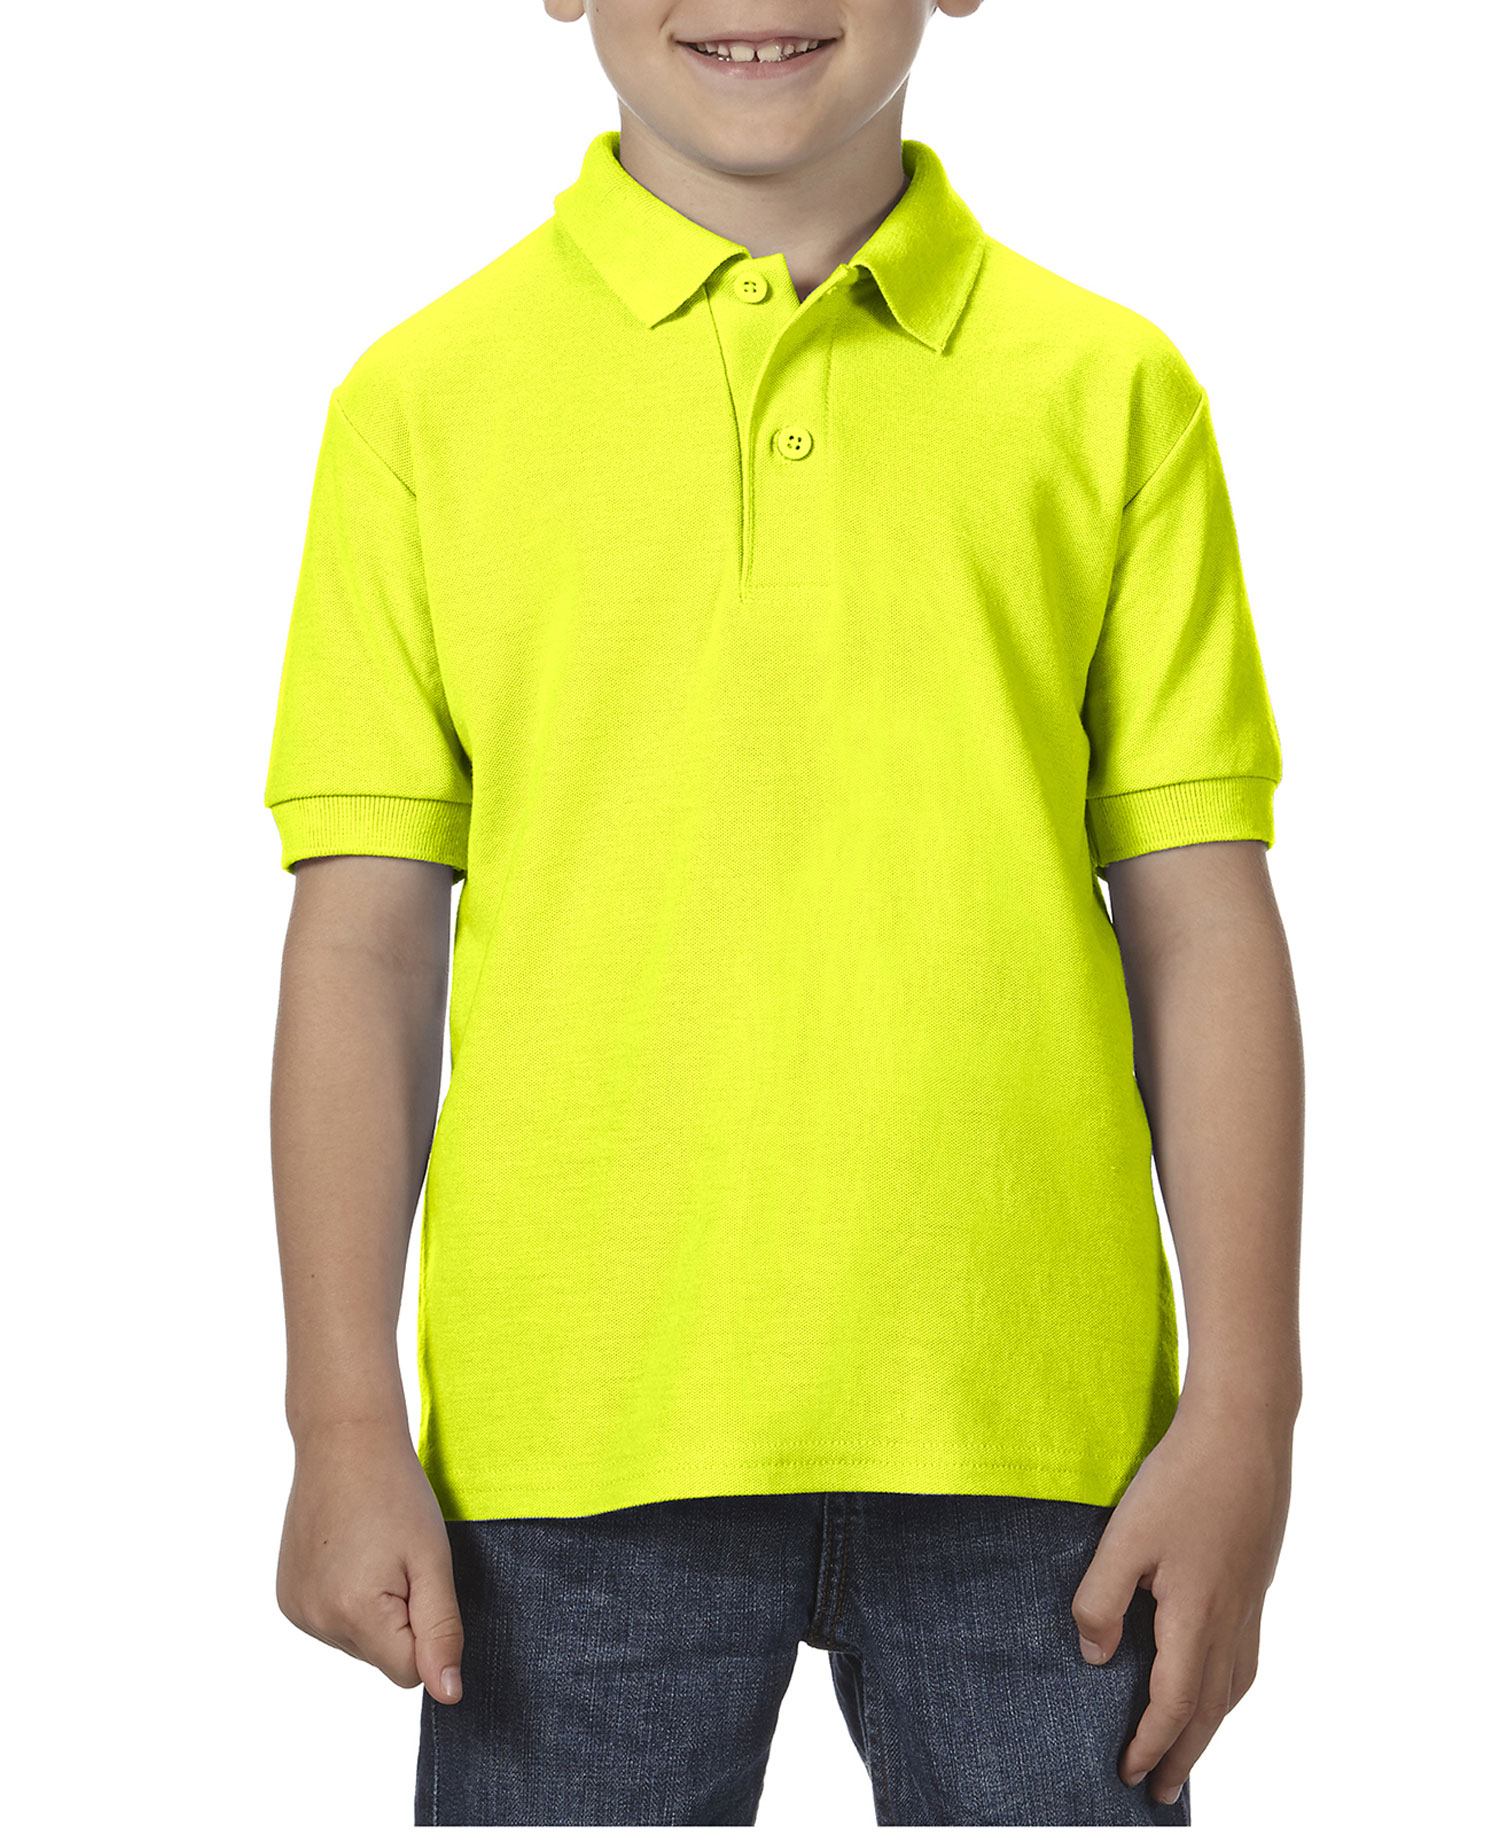 Gildan - G72800B Yth Dryblnd Dble Pq Sportshirt